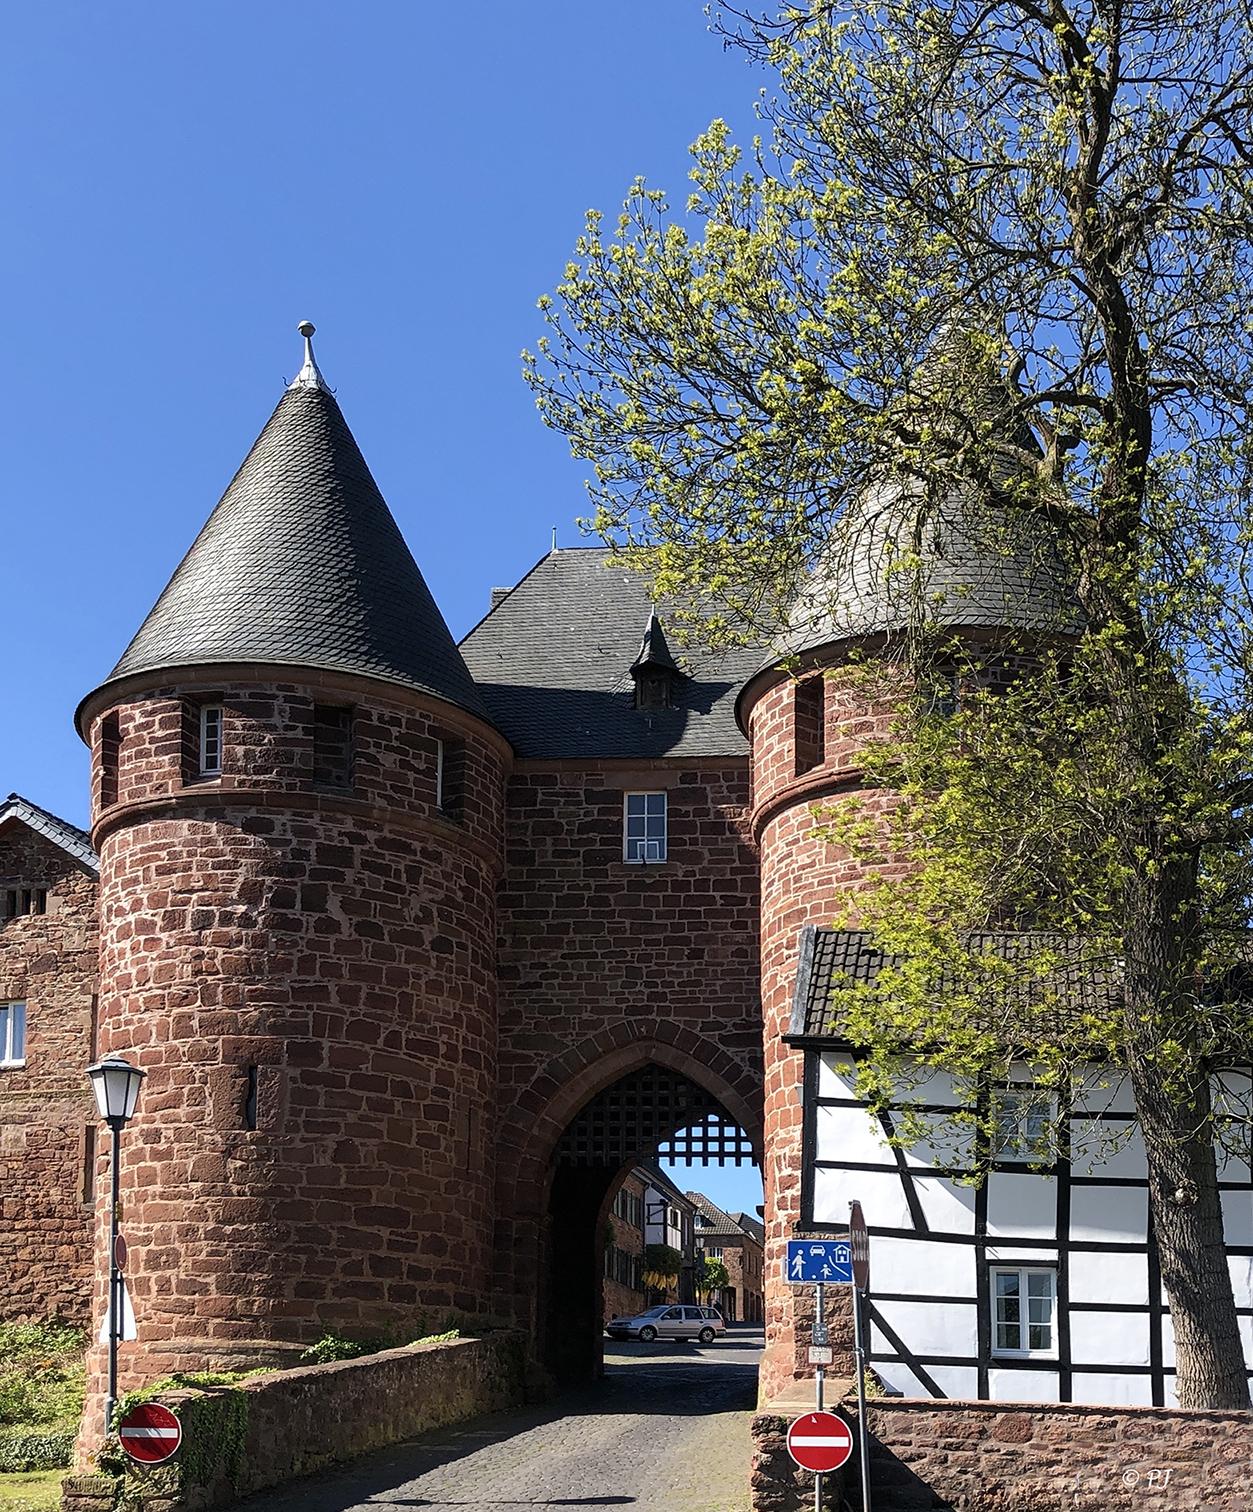 Altes Stadttor von Nideggen: Dürener Tor